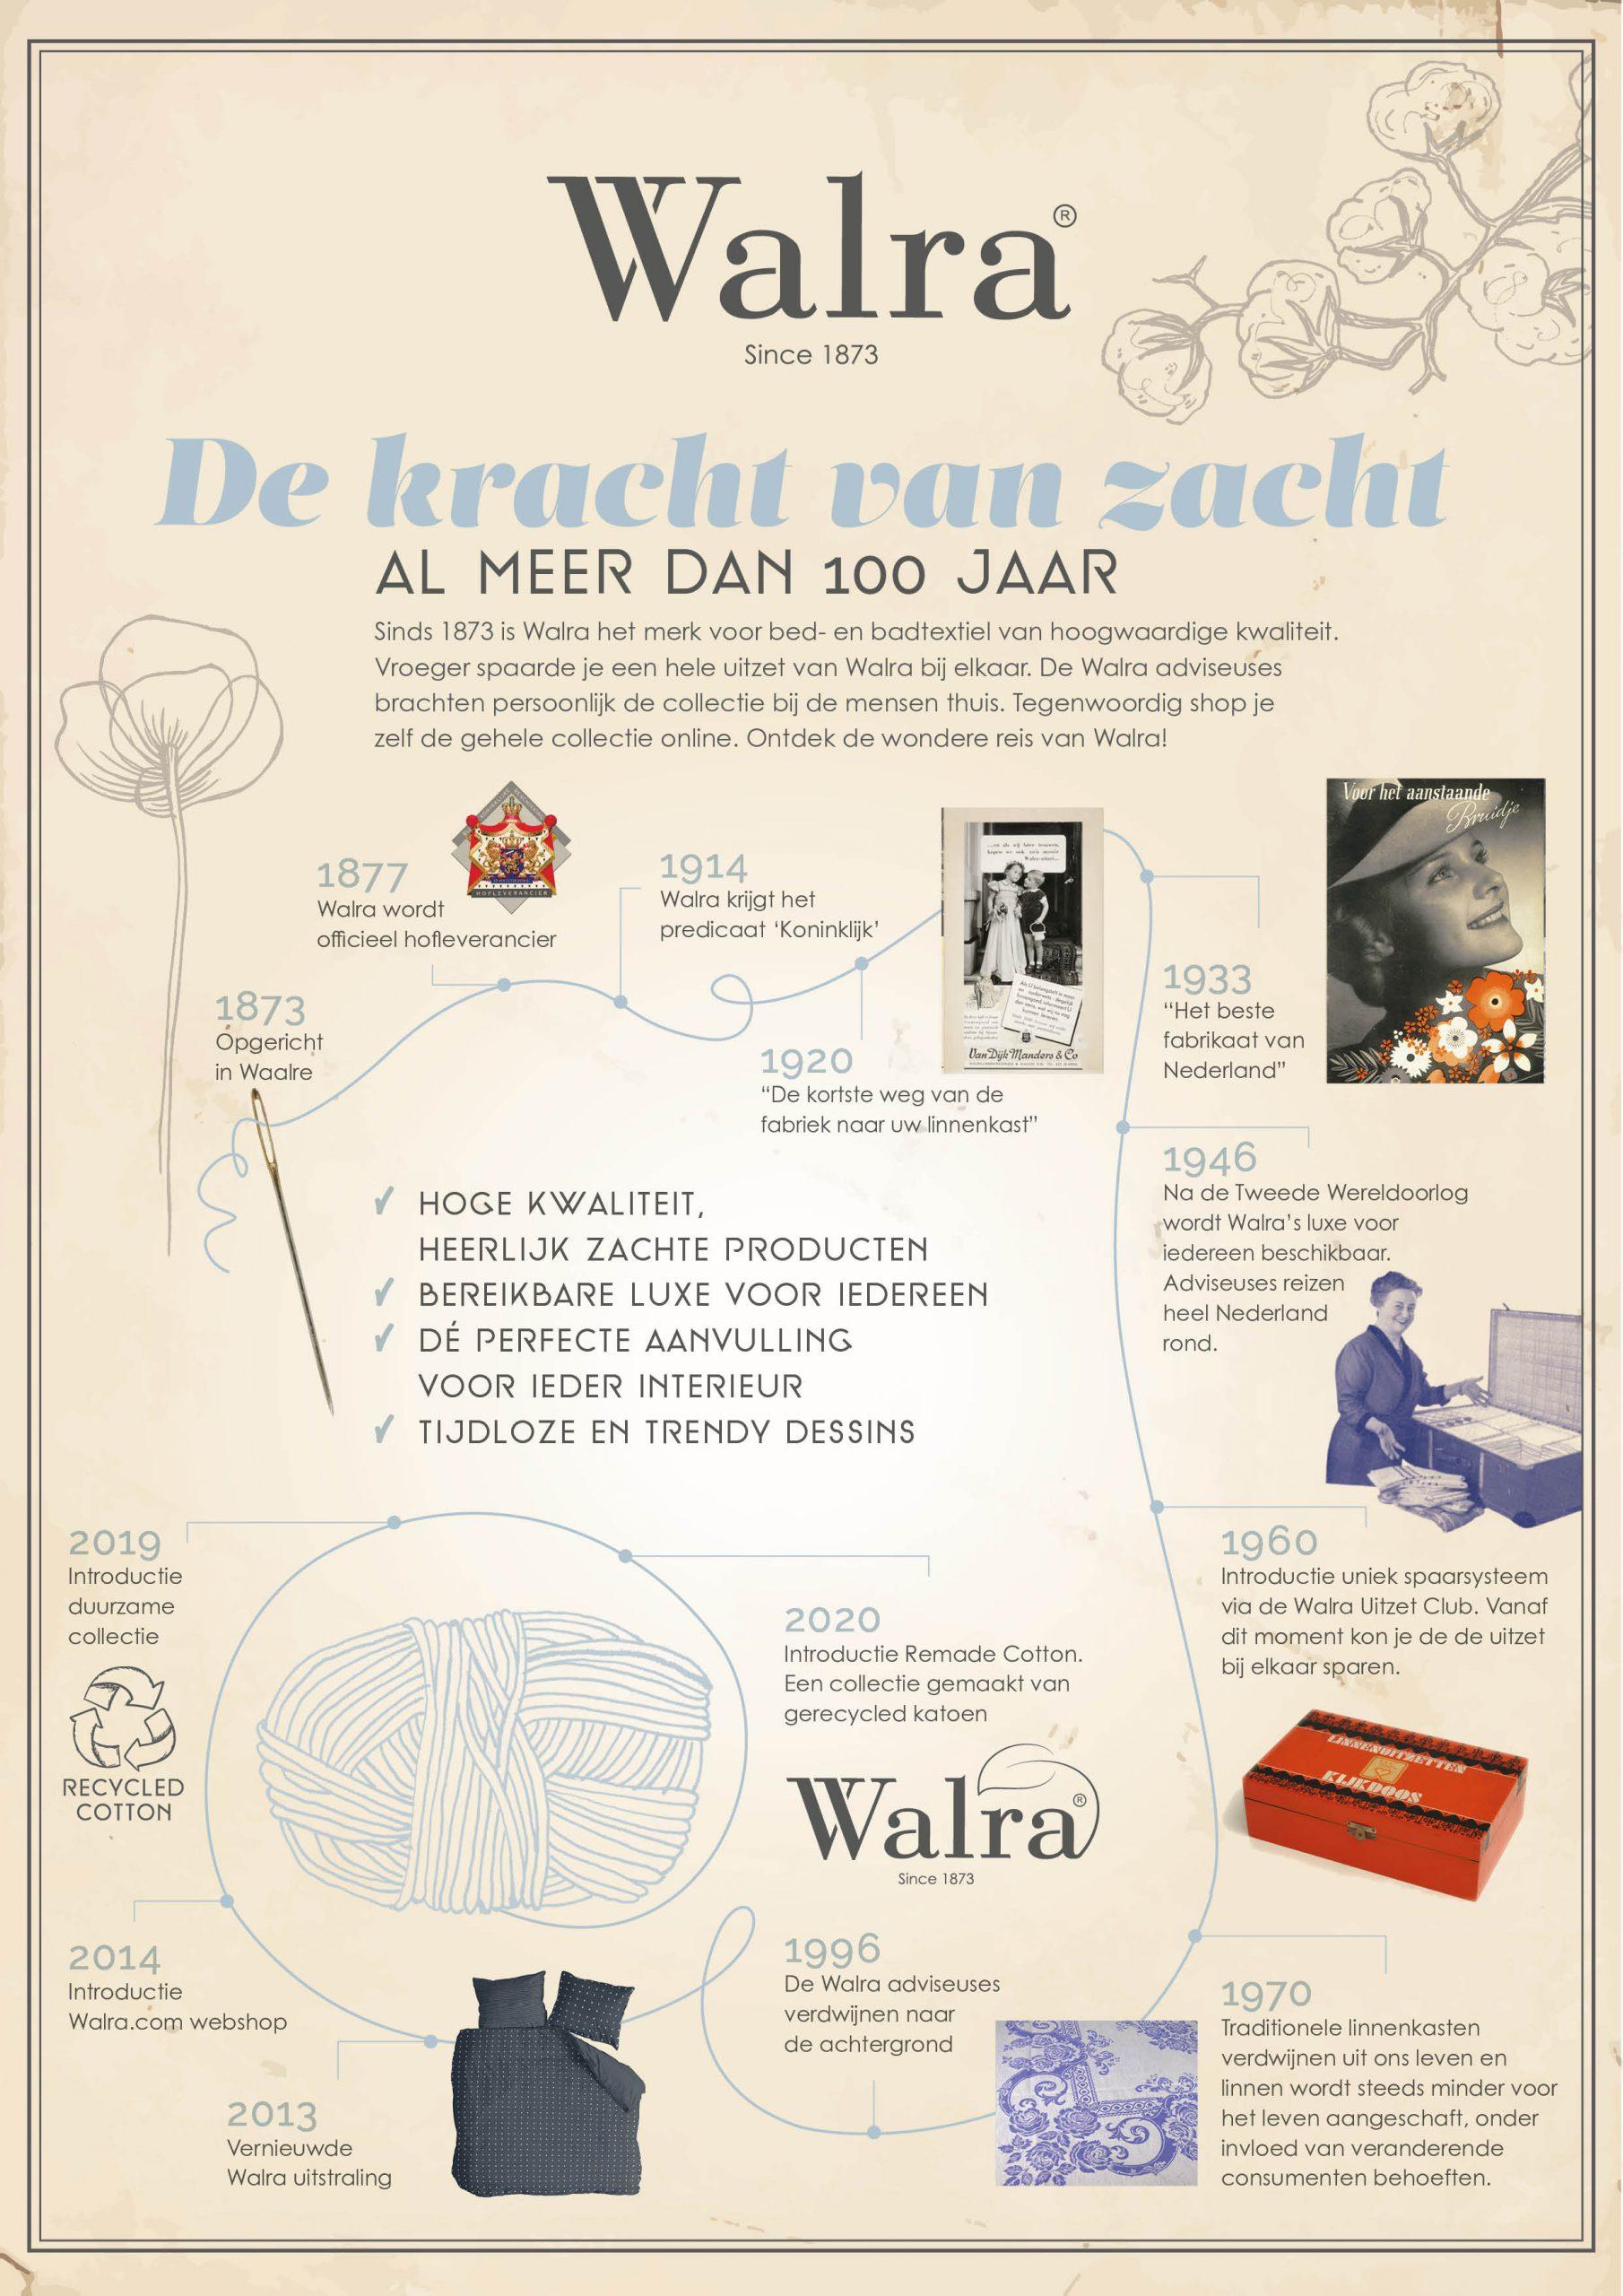 Geschiedenis Walra sinds 1873